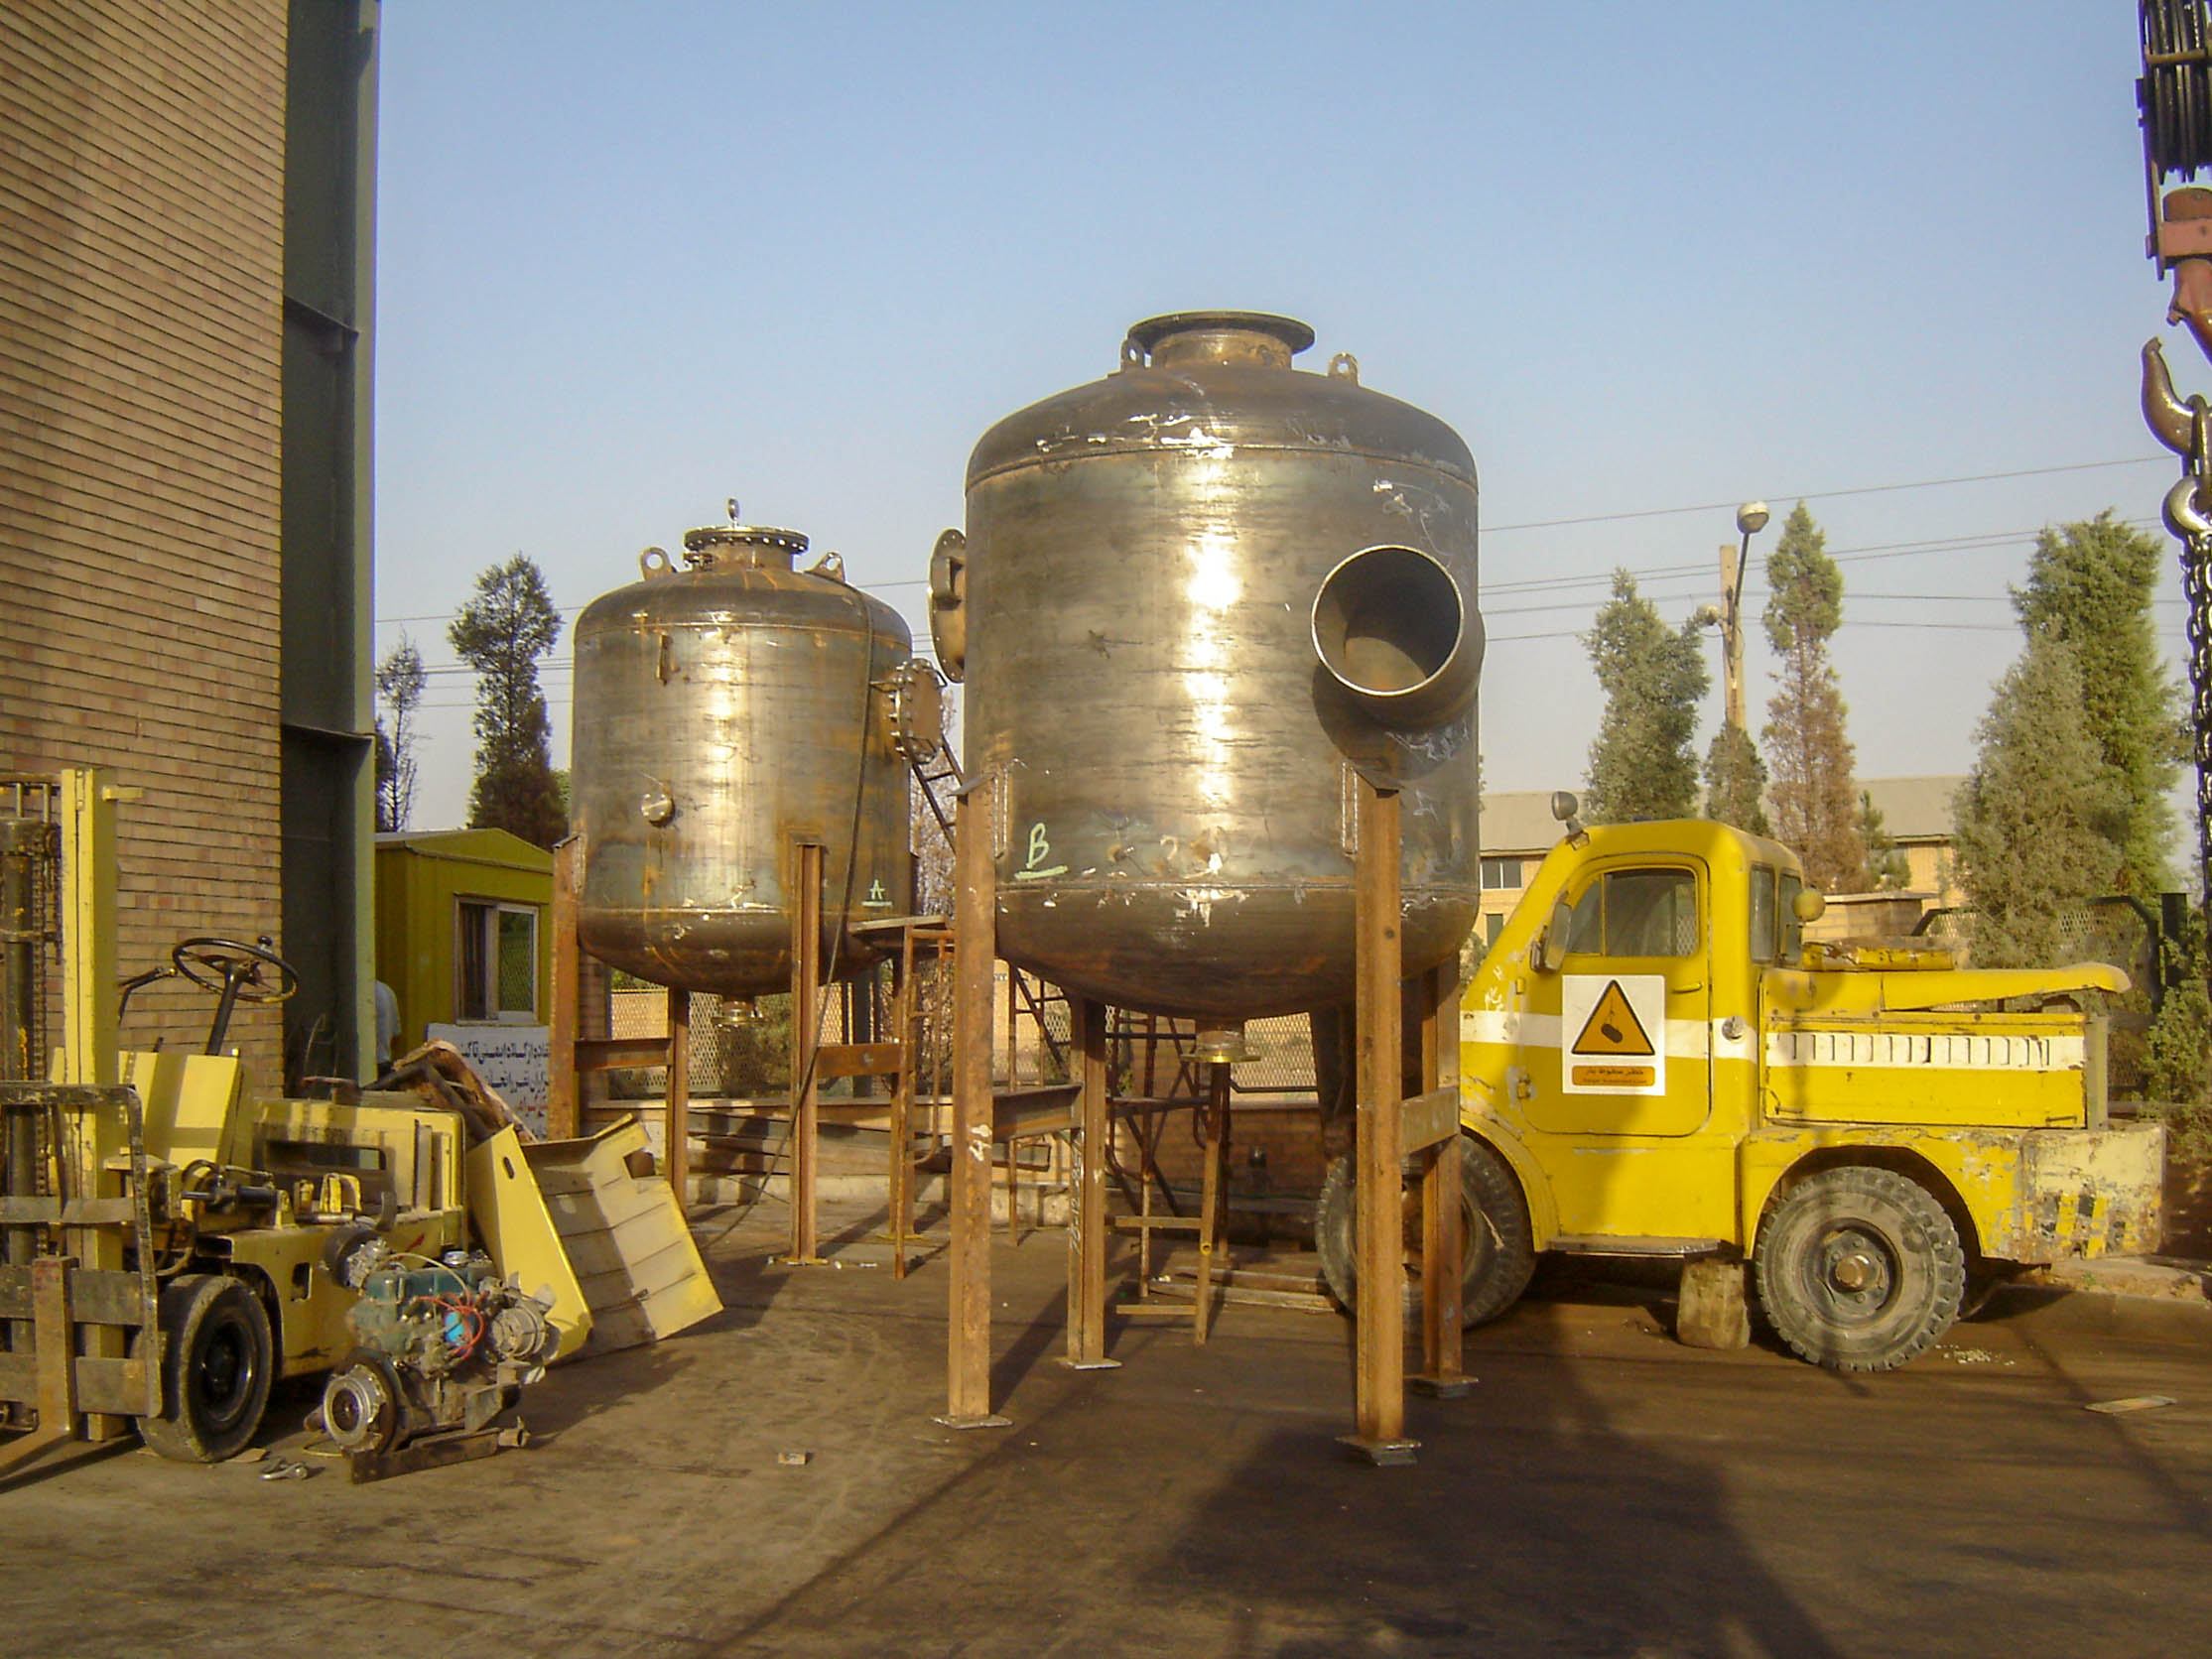 Gole-gohar Steel complex